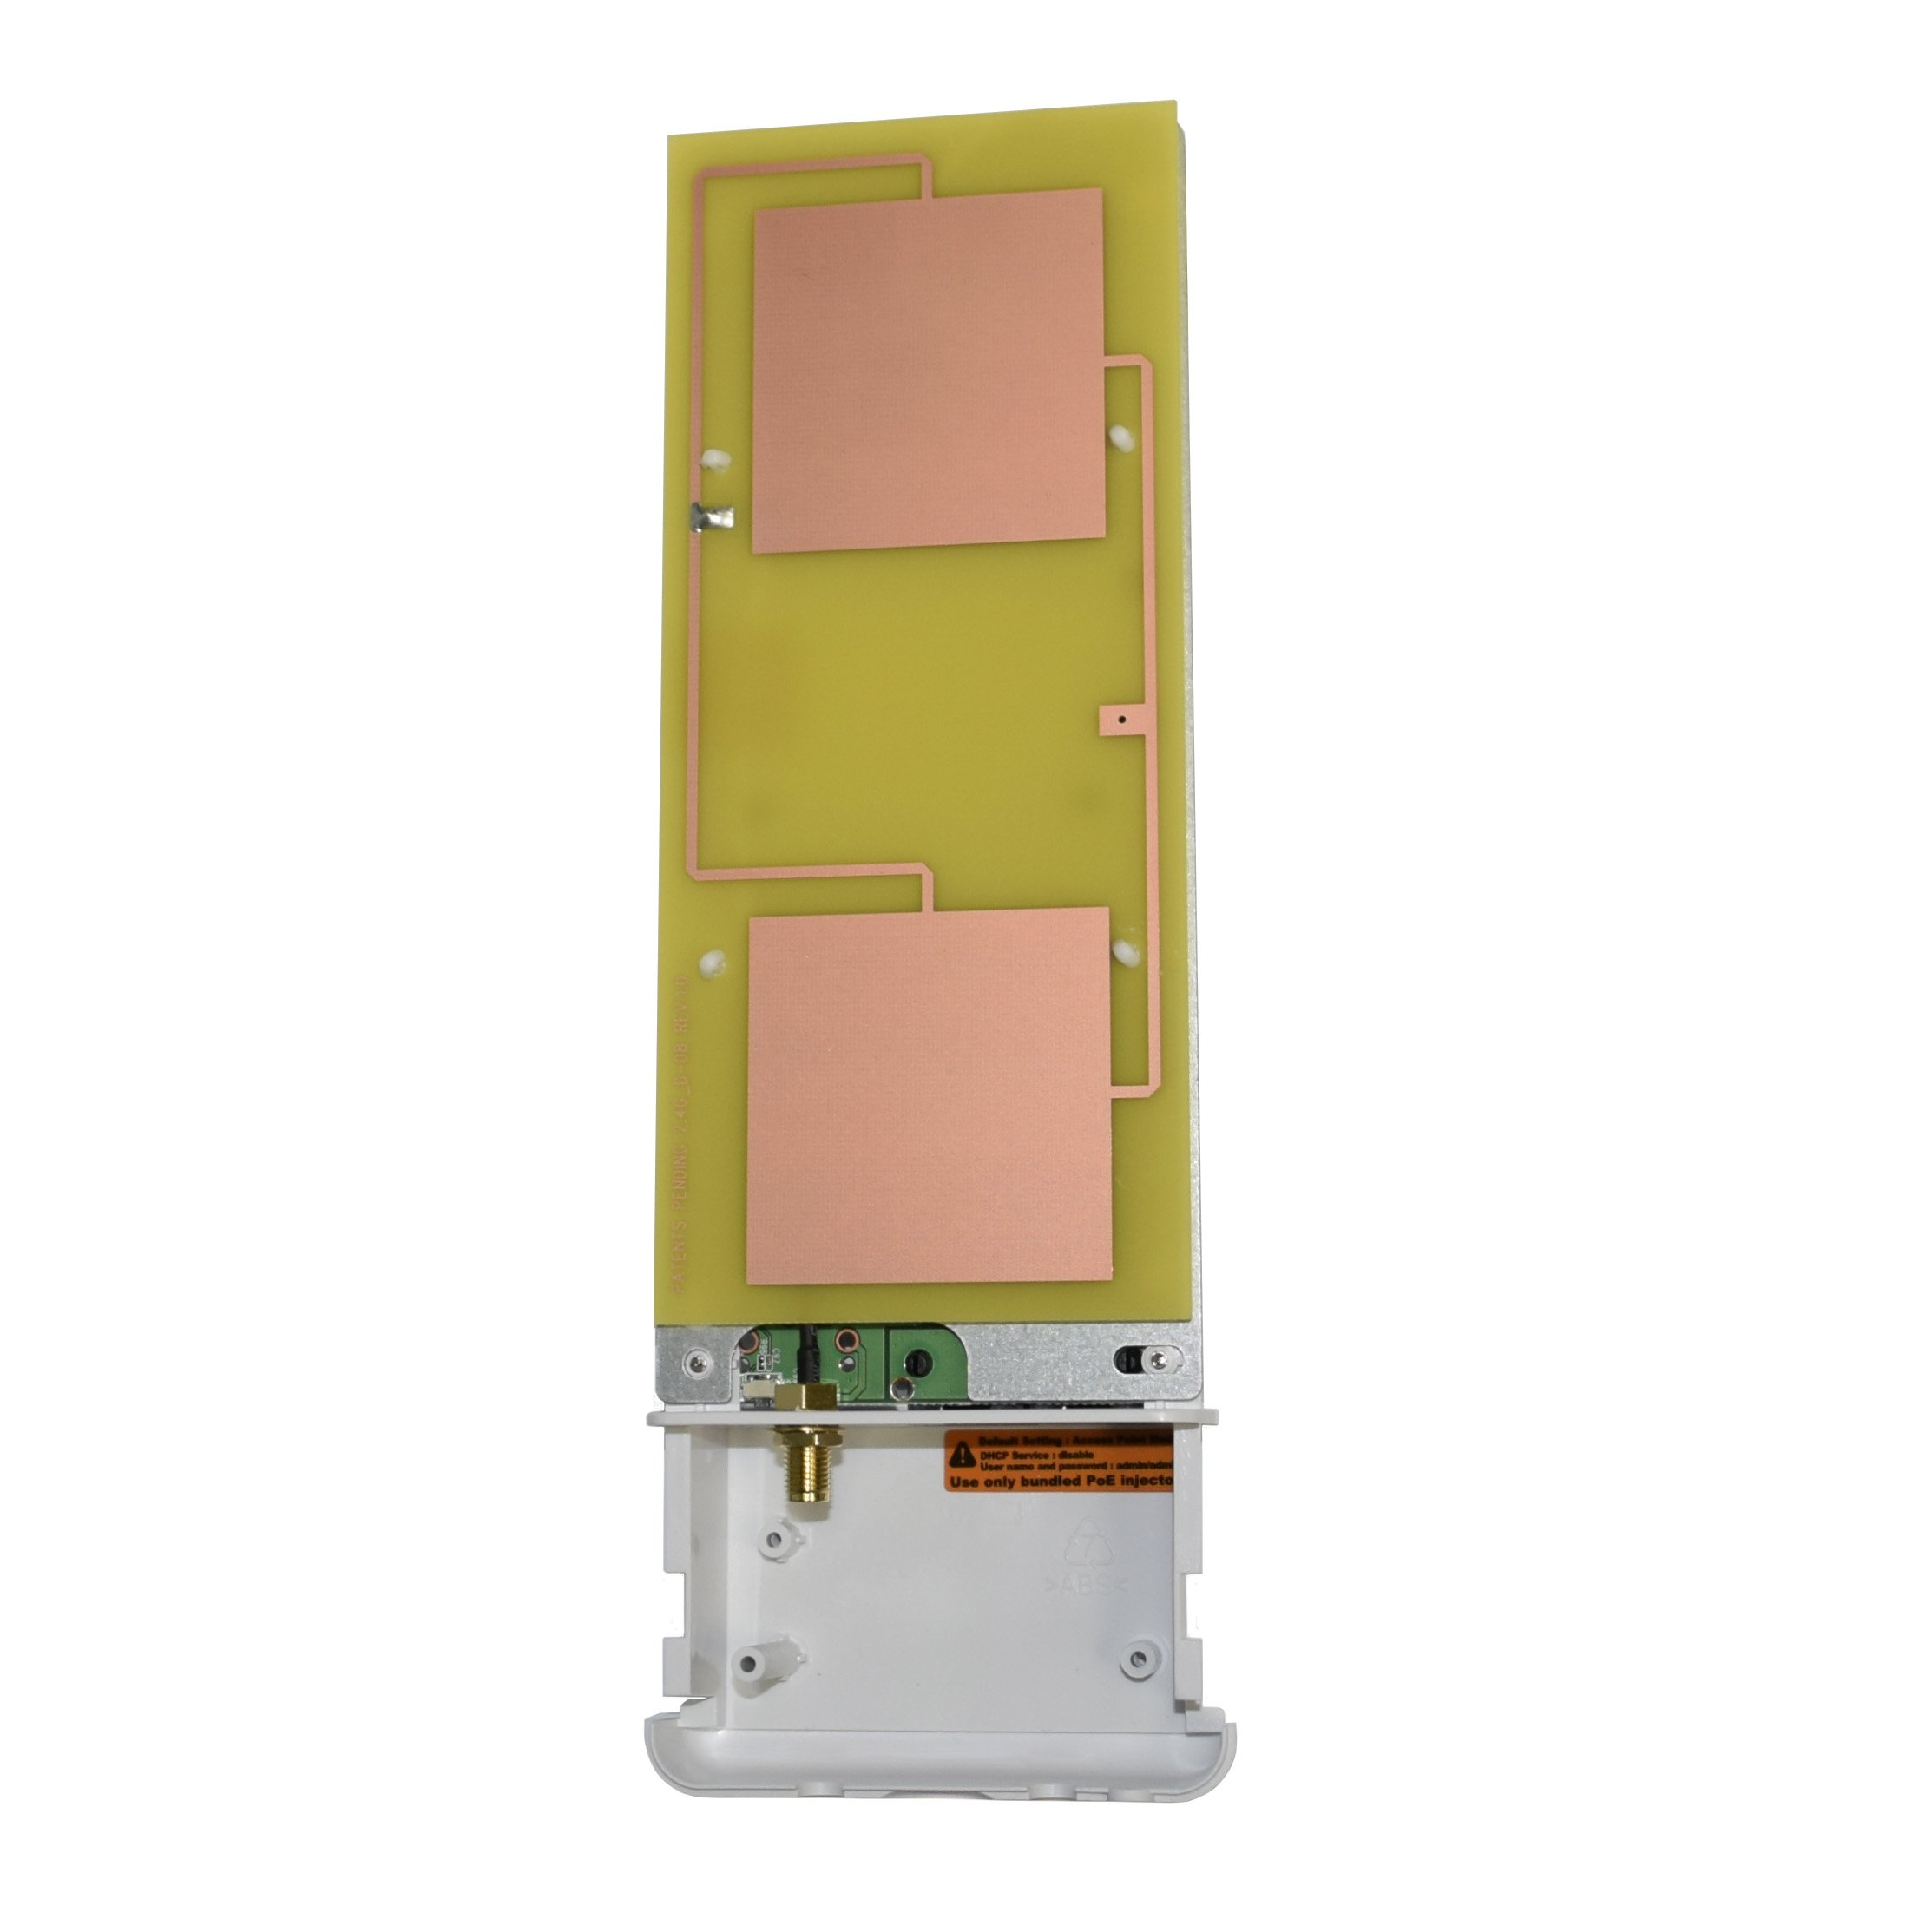 Loopcomm Outdoor 802.11b/g/n Wireless High Power CPE/AP/Router/Clint/Bridge/Repeater (LP-7316K) by Loopcomm (Image #4)